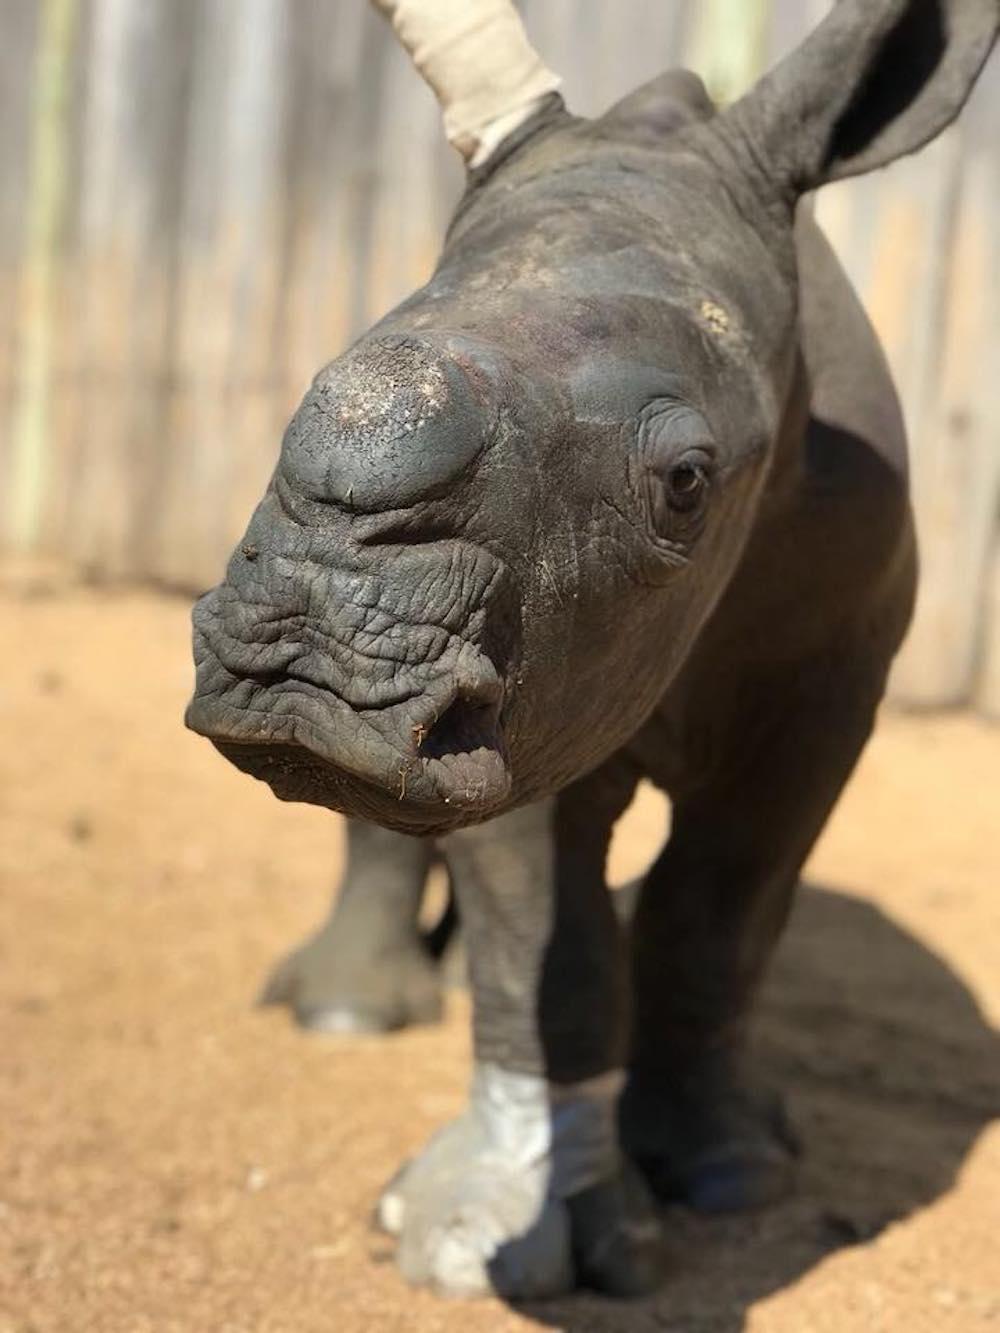 neushoorn in zuid afrika